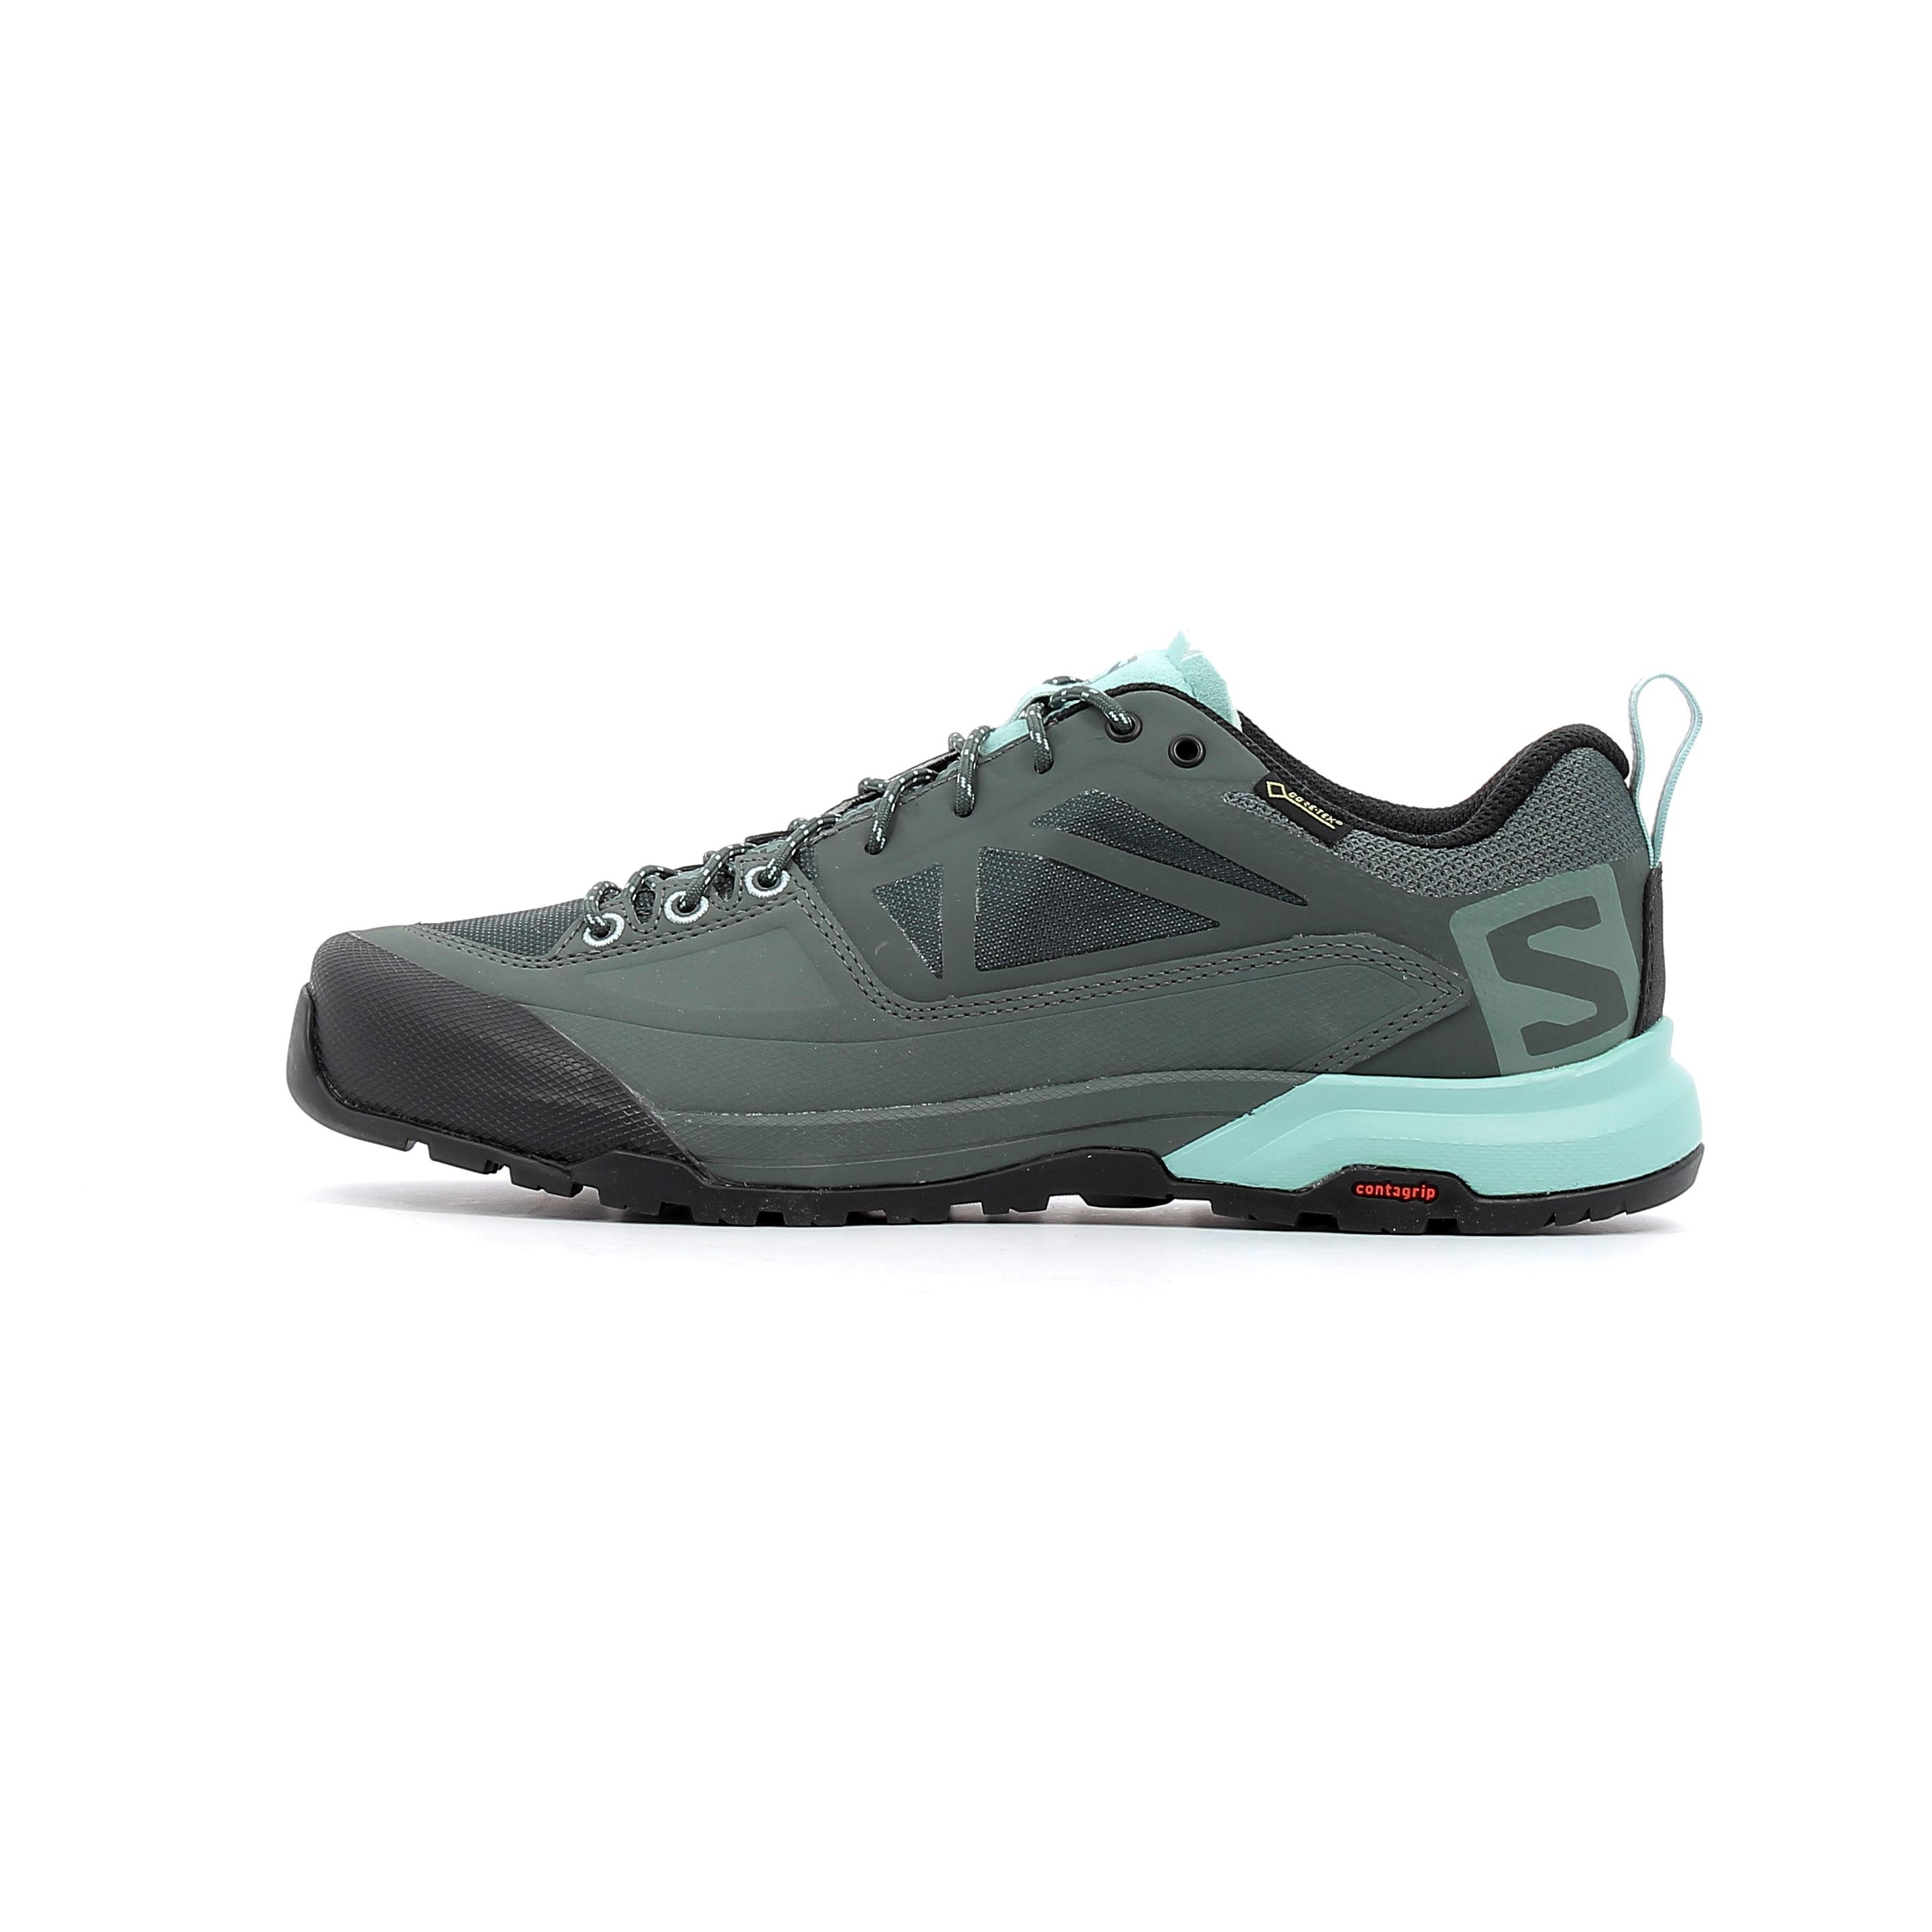 Chaussures Salomon D'alpinisme Gtx Spry W X Alp 44Rxn5Ov